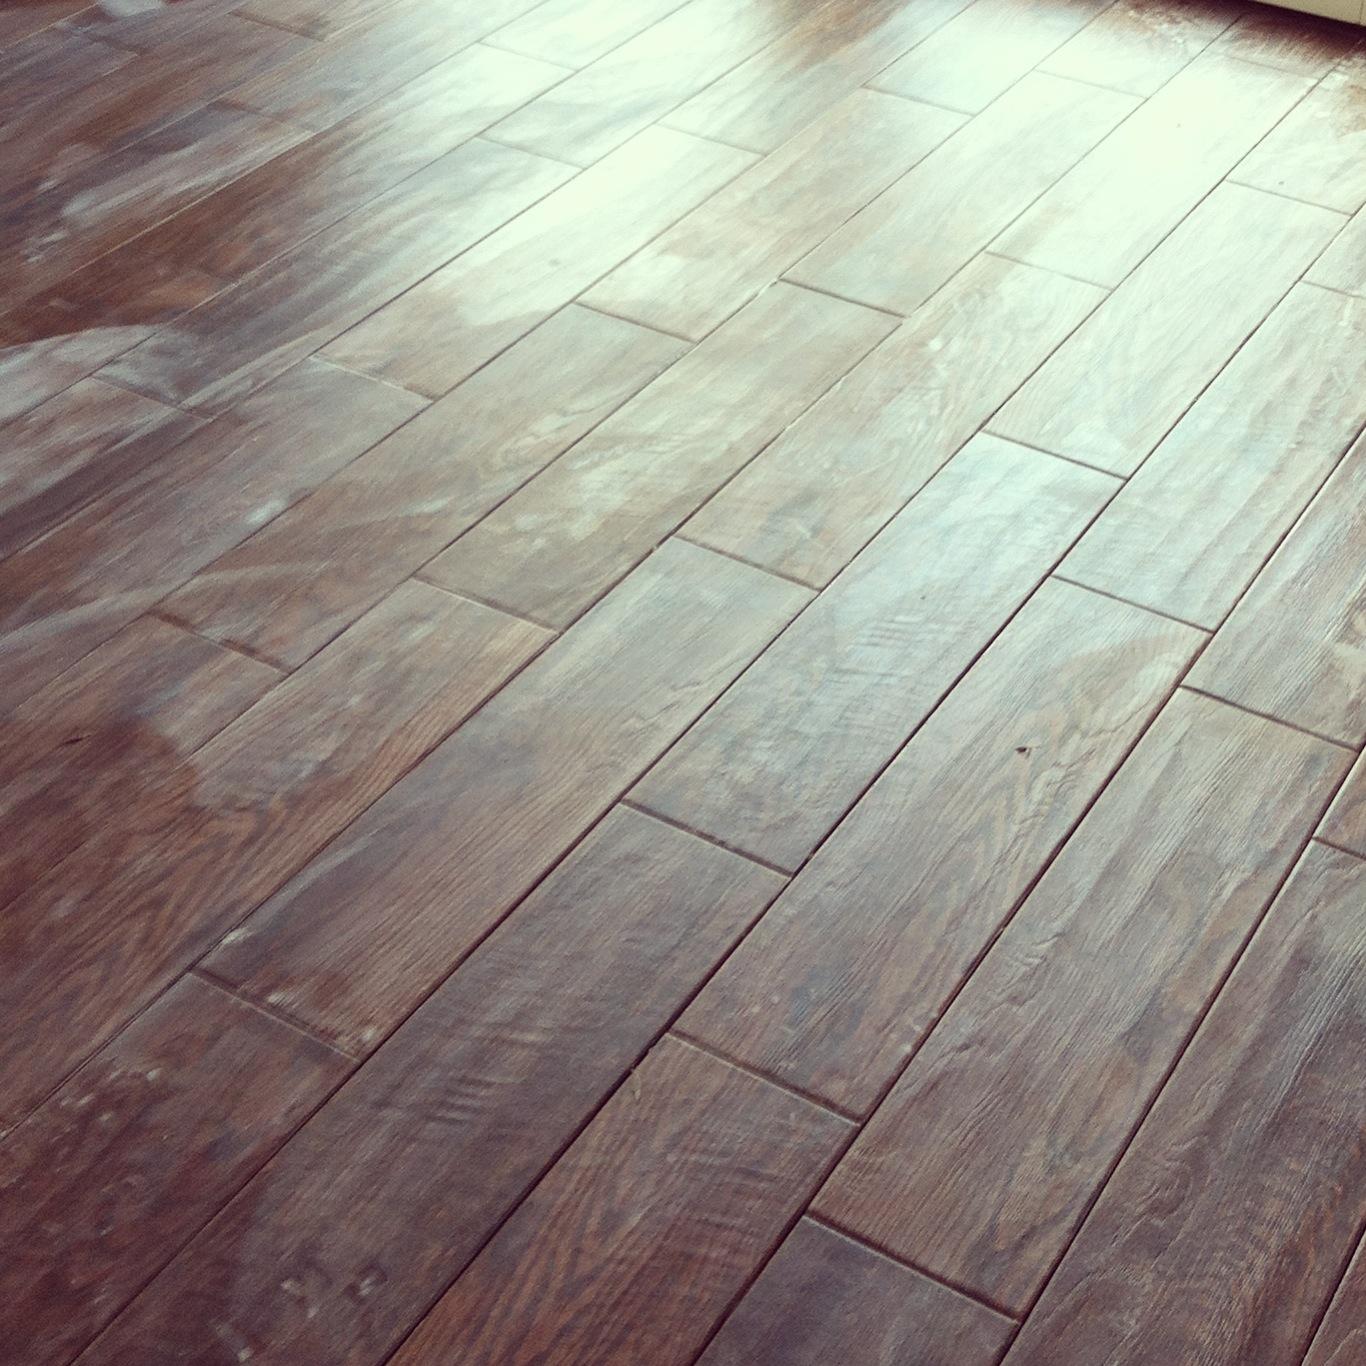 The Flooring Is In. [Wood Porcelain Tile]